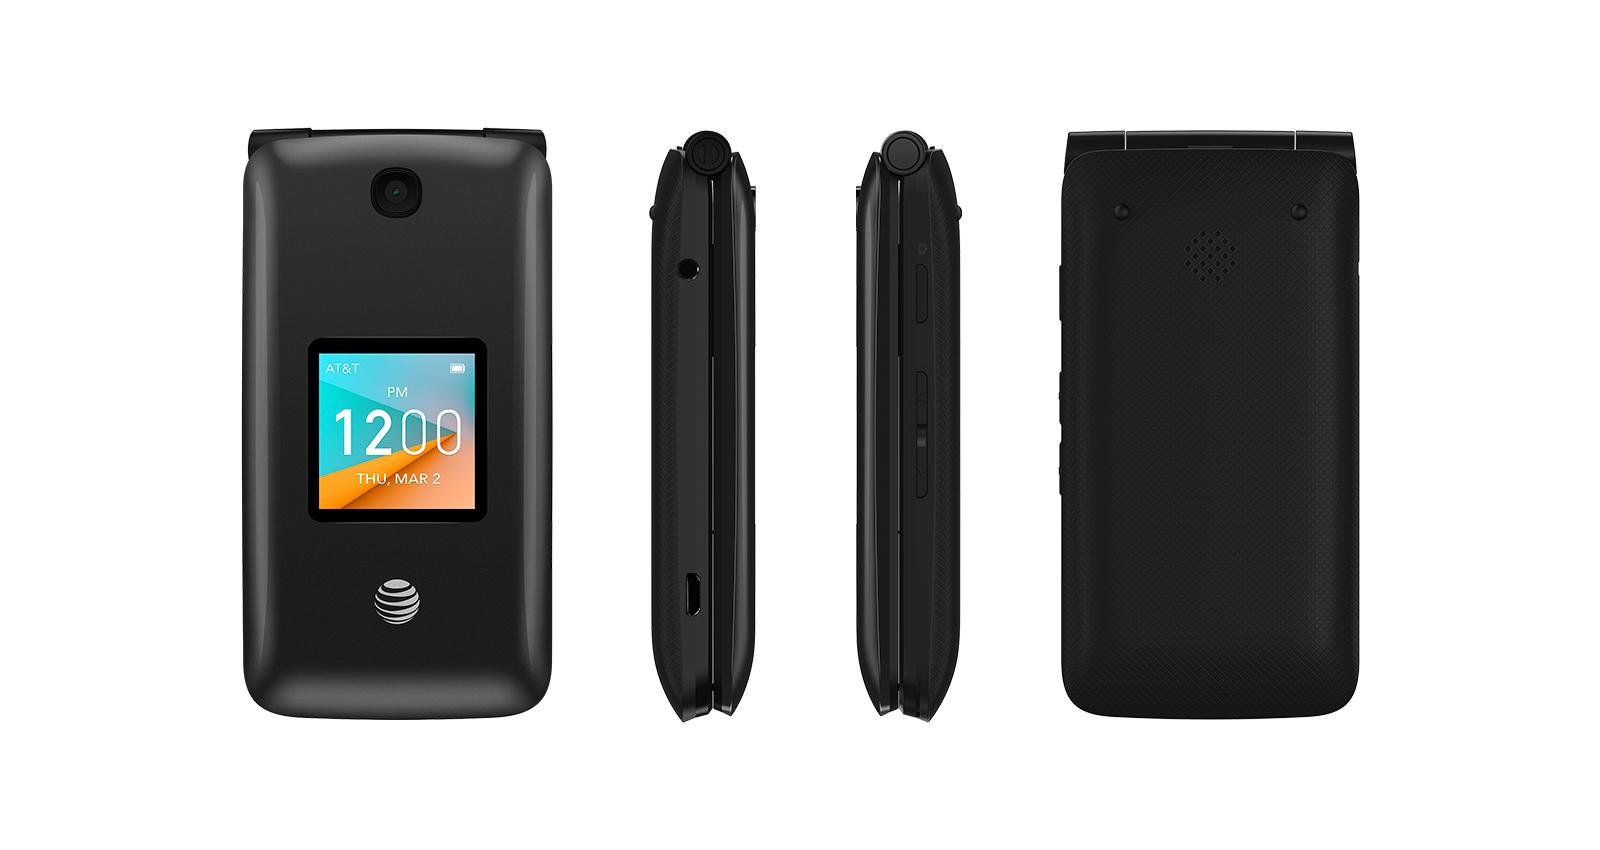 AT&T Cingular Flip™ 2 : Alcatel Mobile